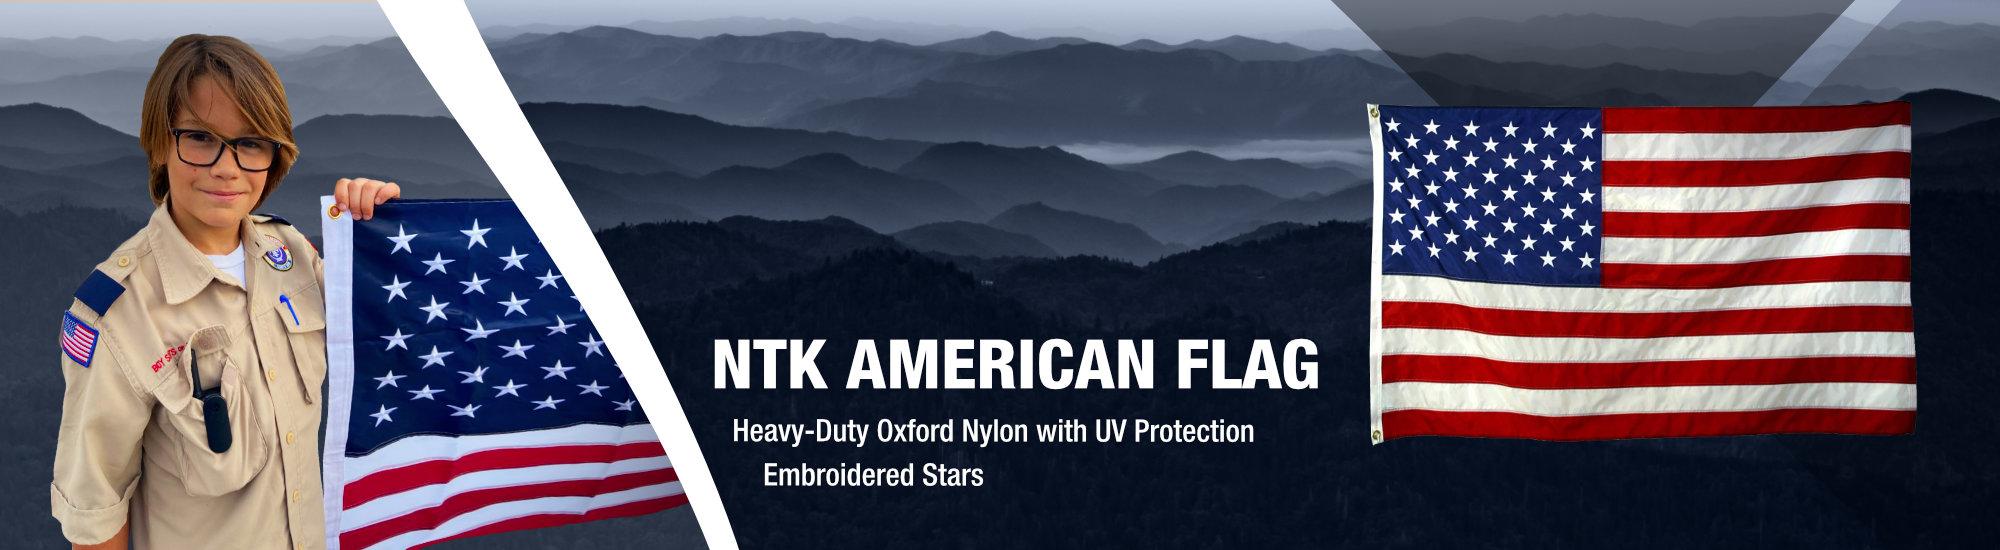 NTK American Flag